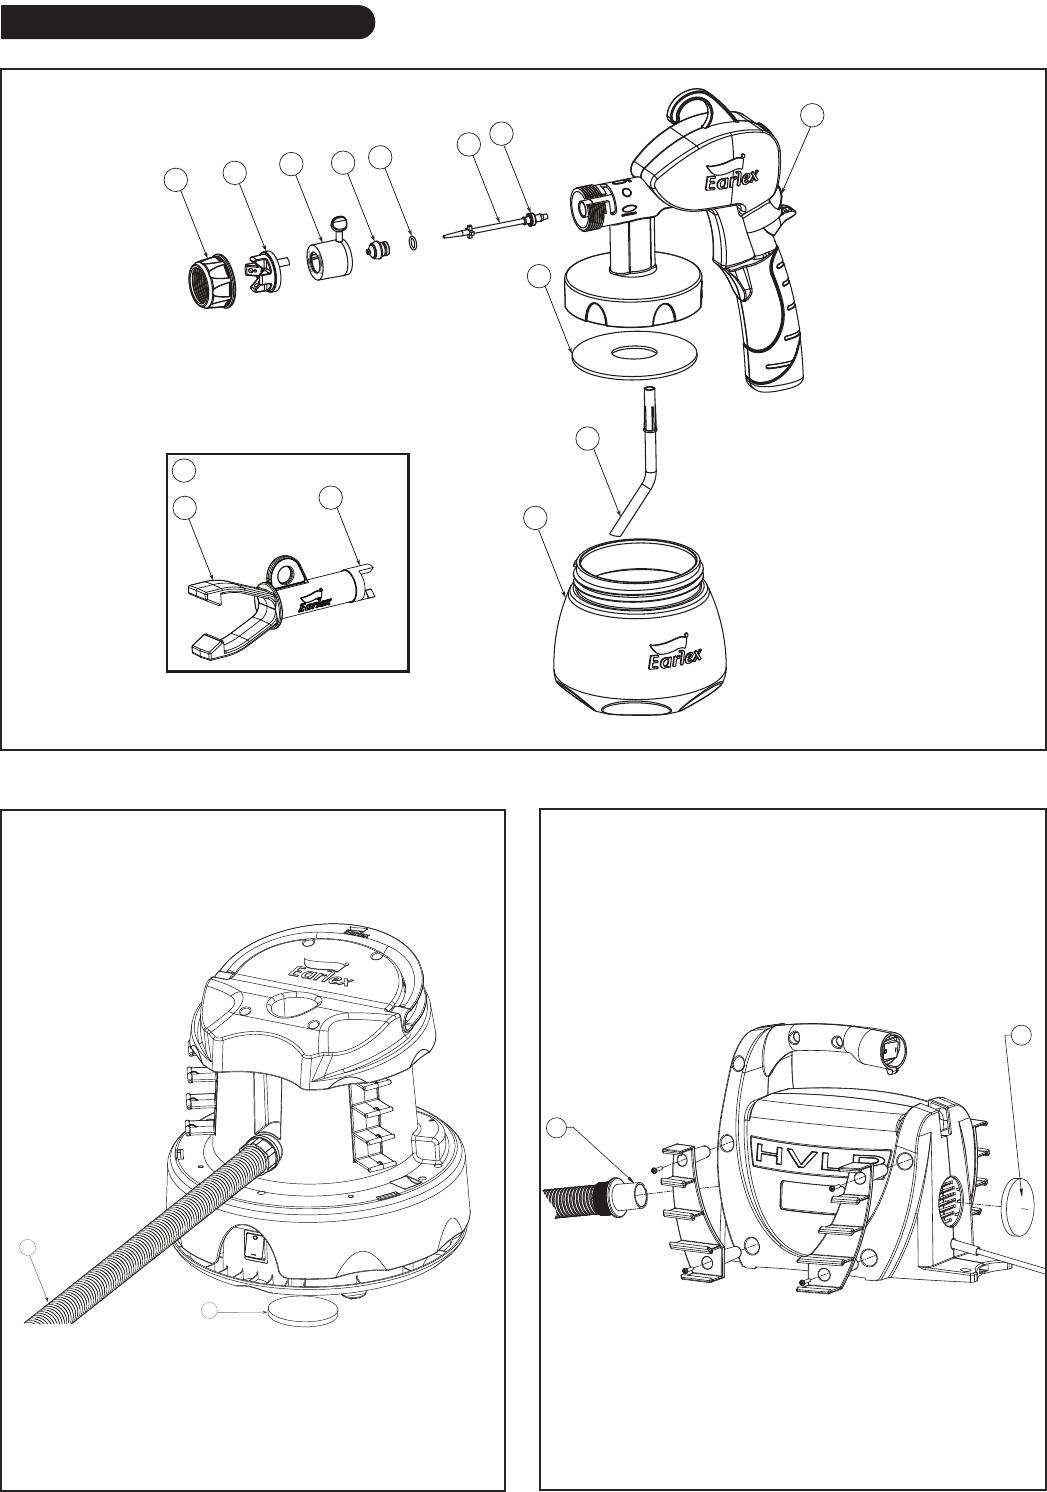 Earlex Spray Staton Hv2900 Users Manual